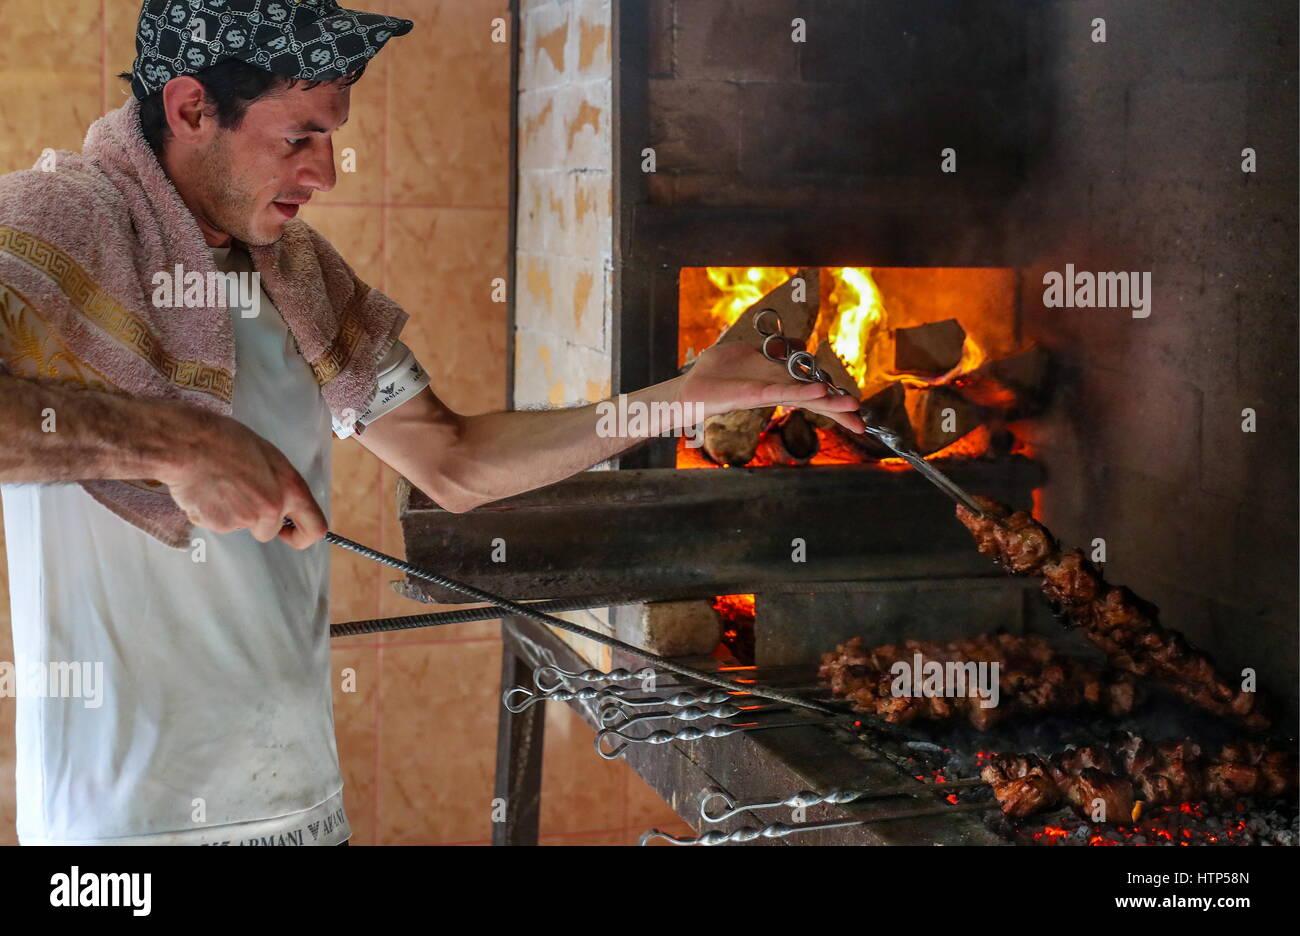 Abkhazian cuisine: a selection of sites